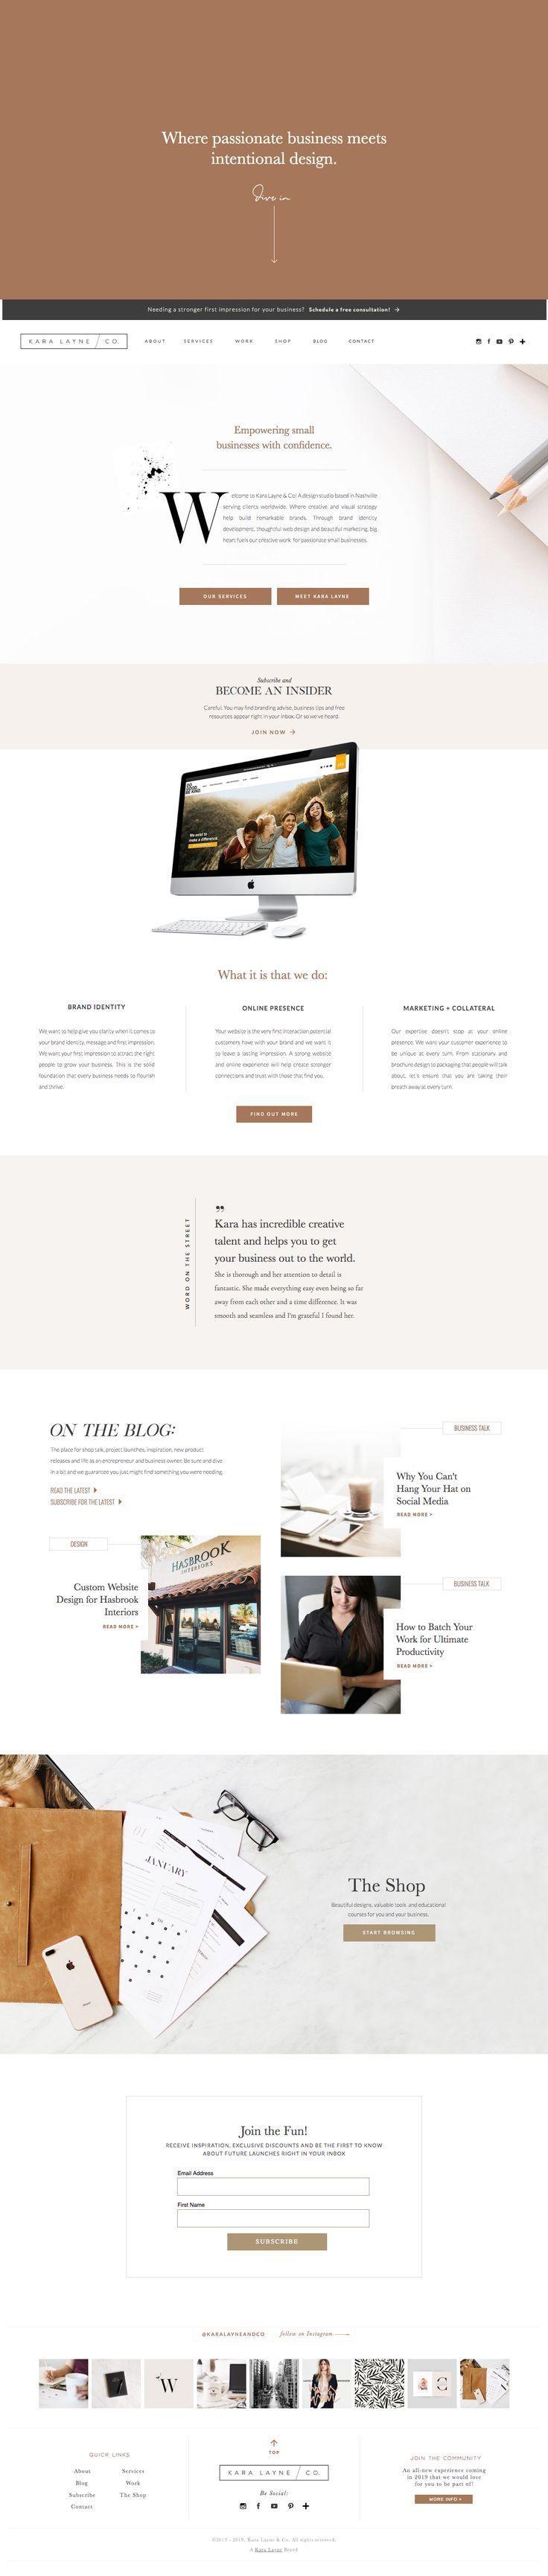 Website Design Inspo Web Development Design Web Design Wordpress Design Inspiration